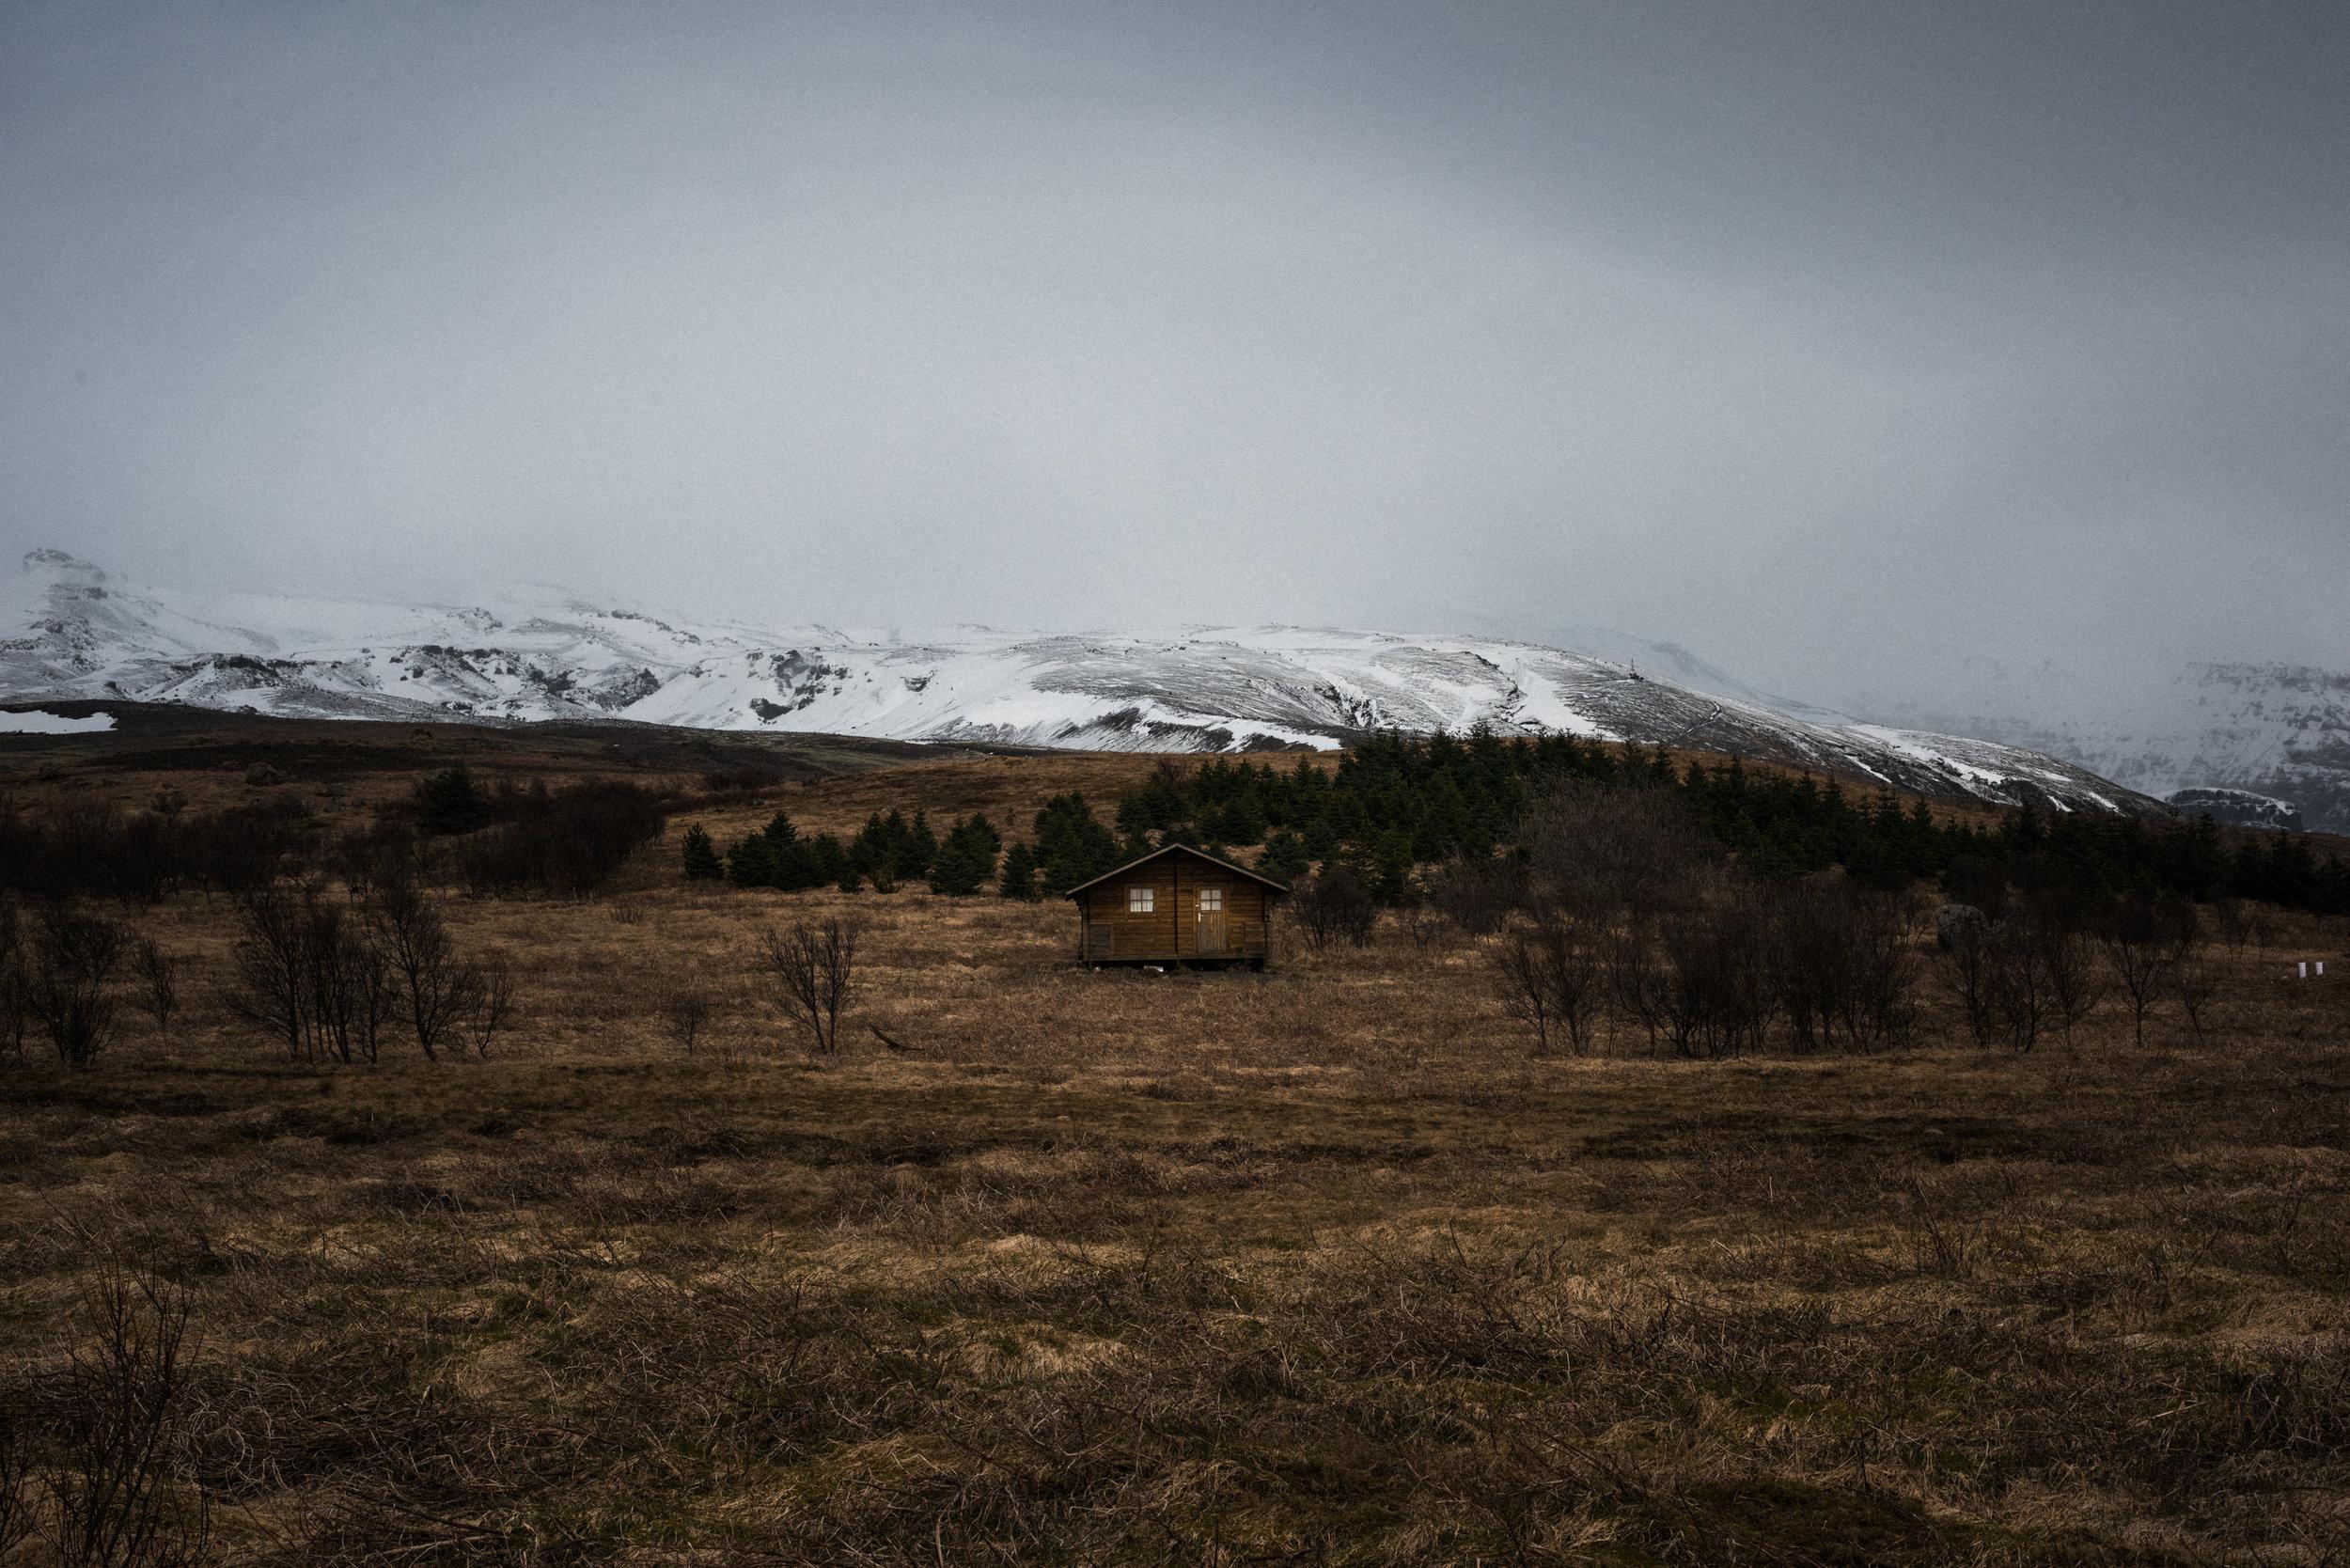 ICELAND_WOMAN_PHOTOGRAPHER_TARASHUPE_OUTDOOR_PHOTOGRAPHY_108.jpg